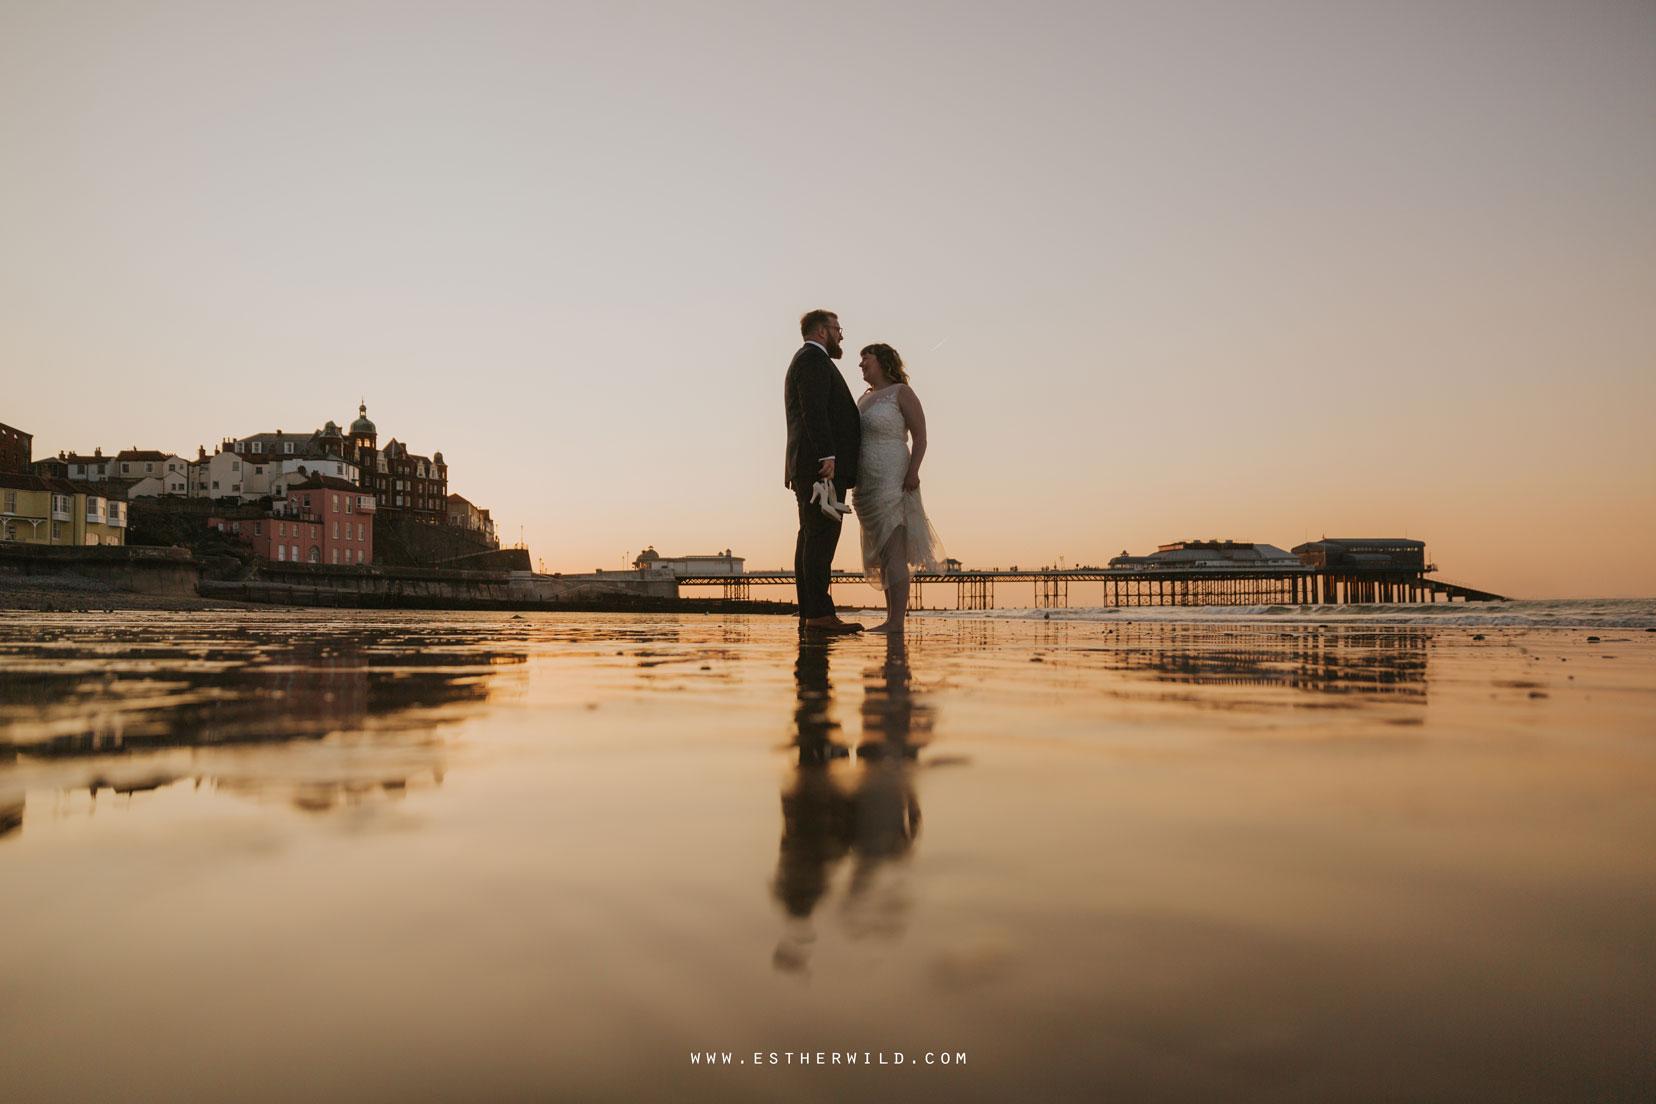 Cromer_Wedding_Beach_Outdoor_Ceremony_Norfolk_North_Lodge_Registry_Office_Rocket_House_Cafe_Cromer_Pier_IMG_5006_IMGL8508.jpg